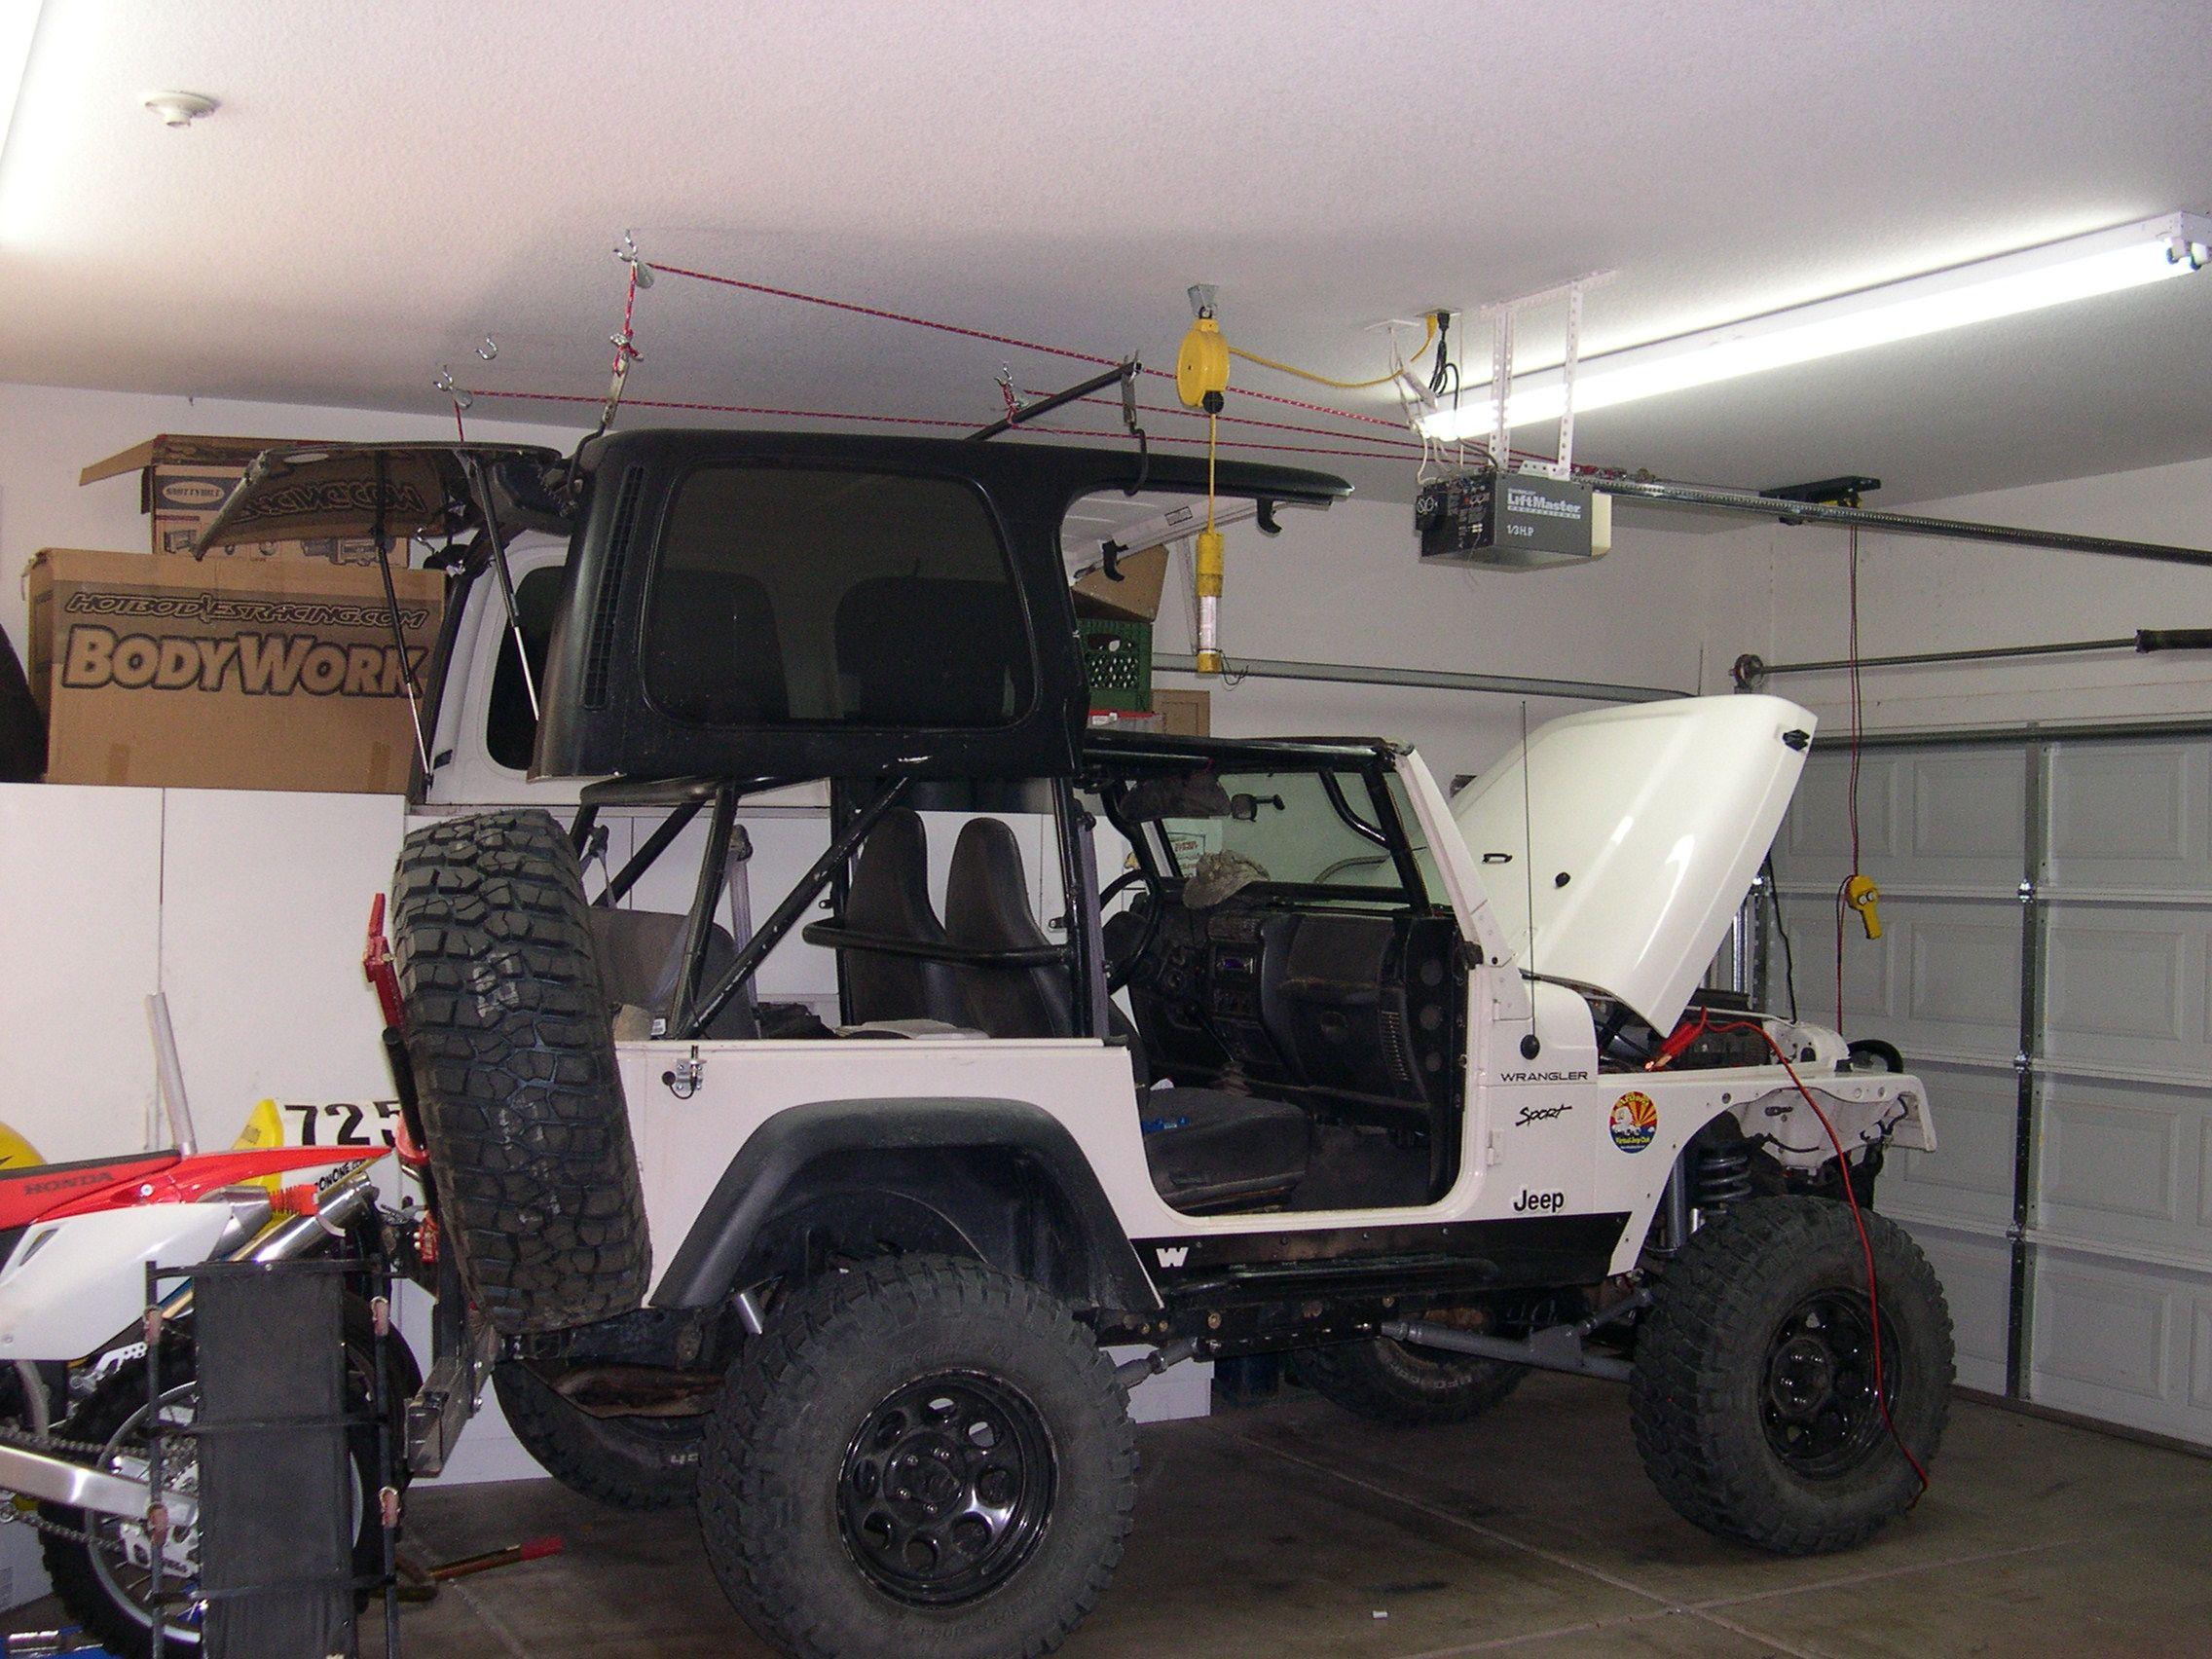 Jeep Hardtop Hoist Diy Google Search Jeep Hard Top Jeep Jeep Wrangler